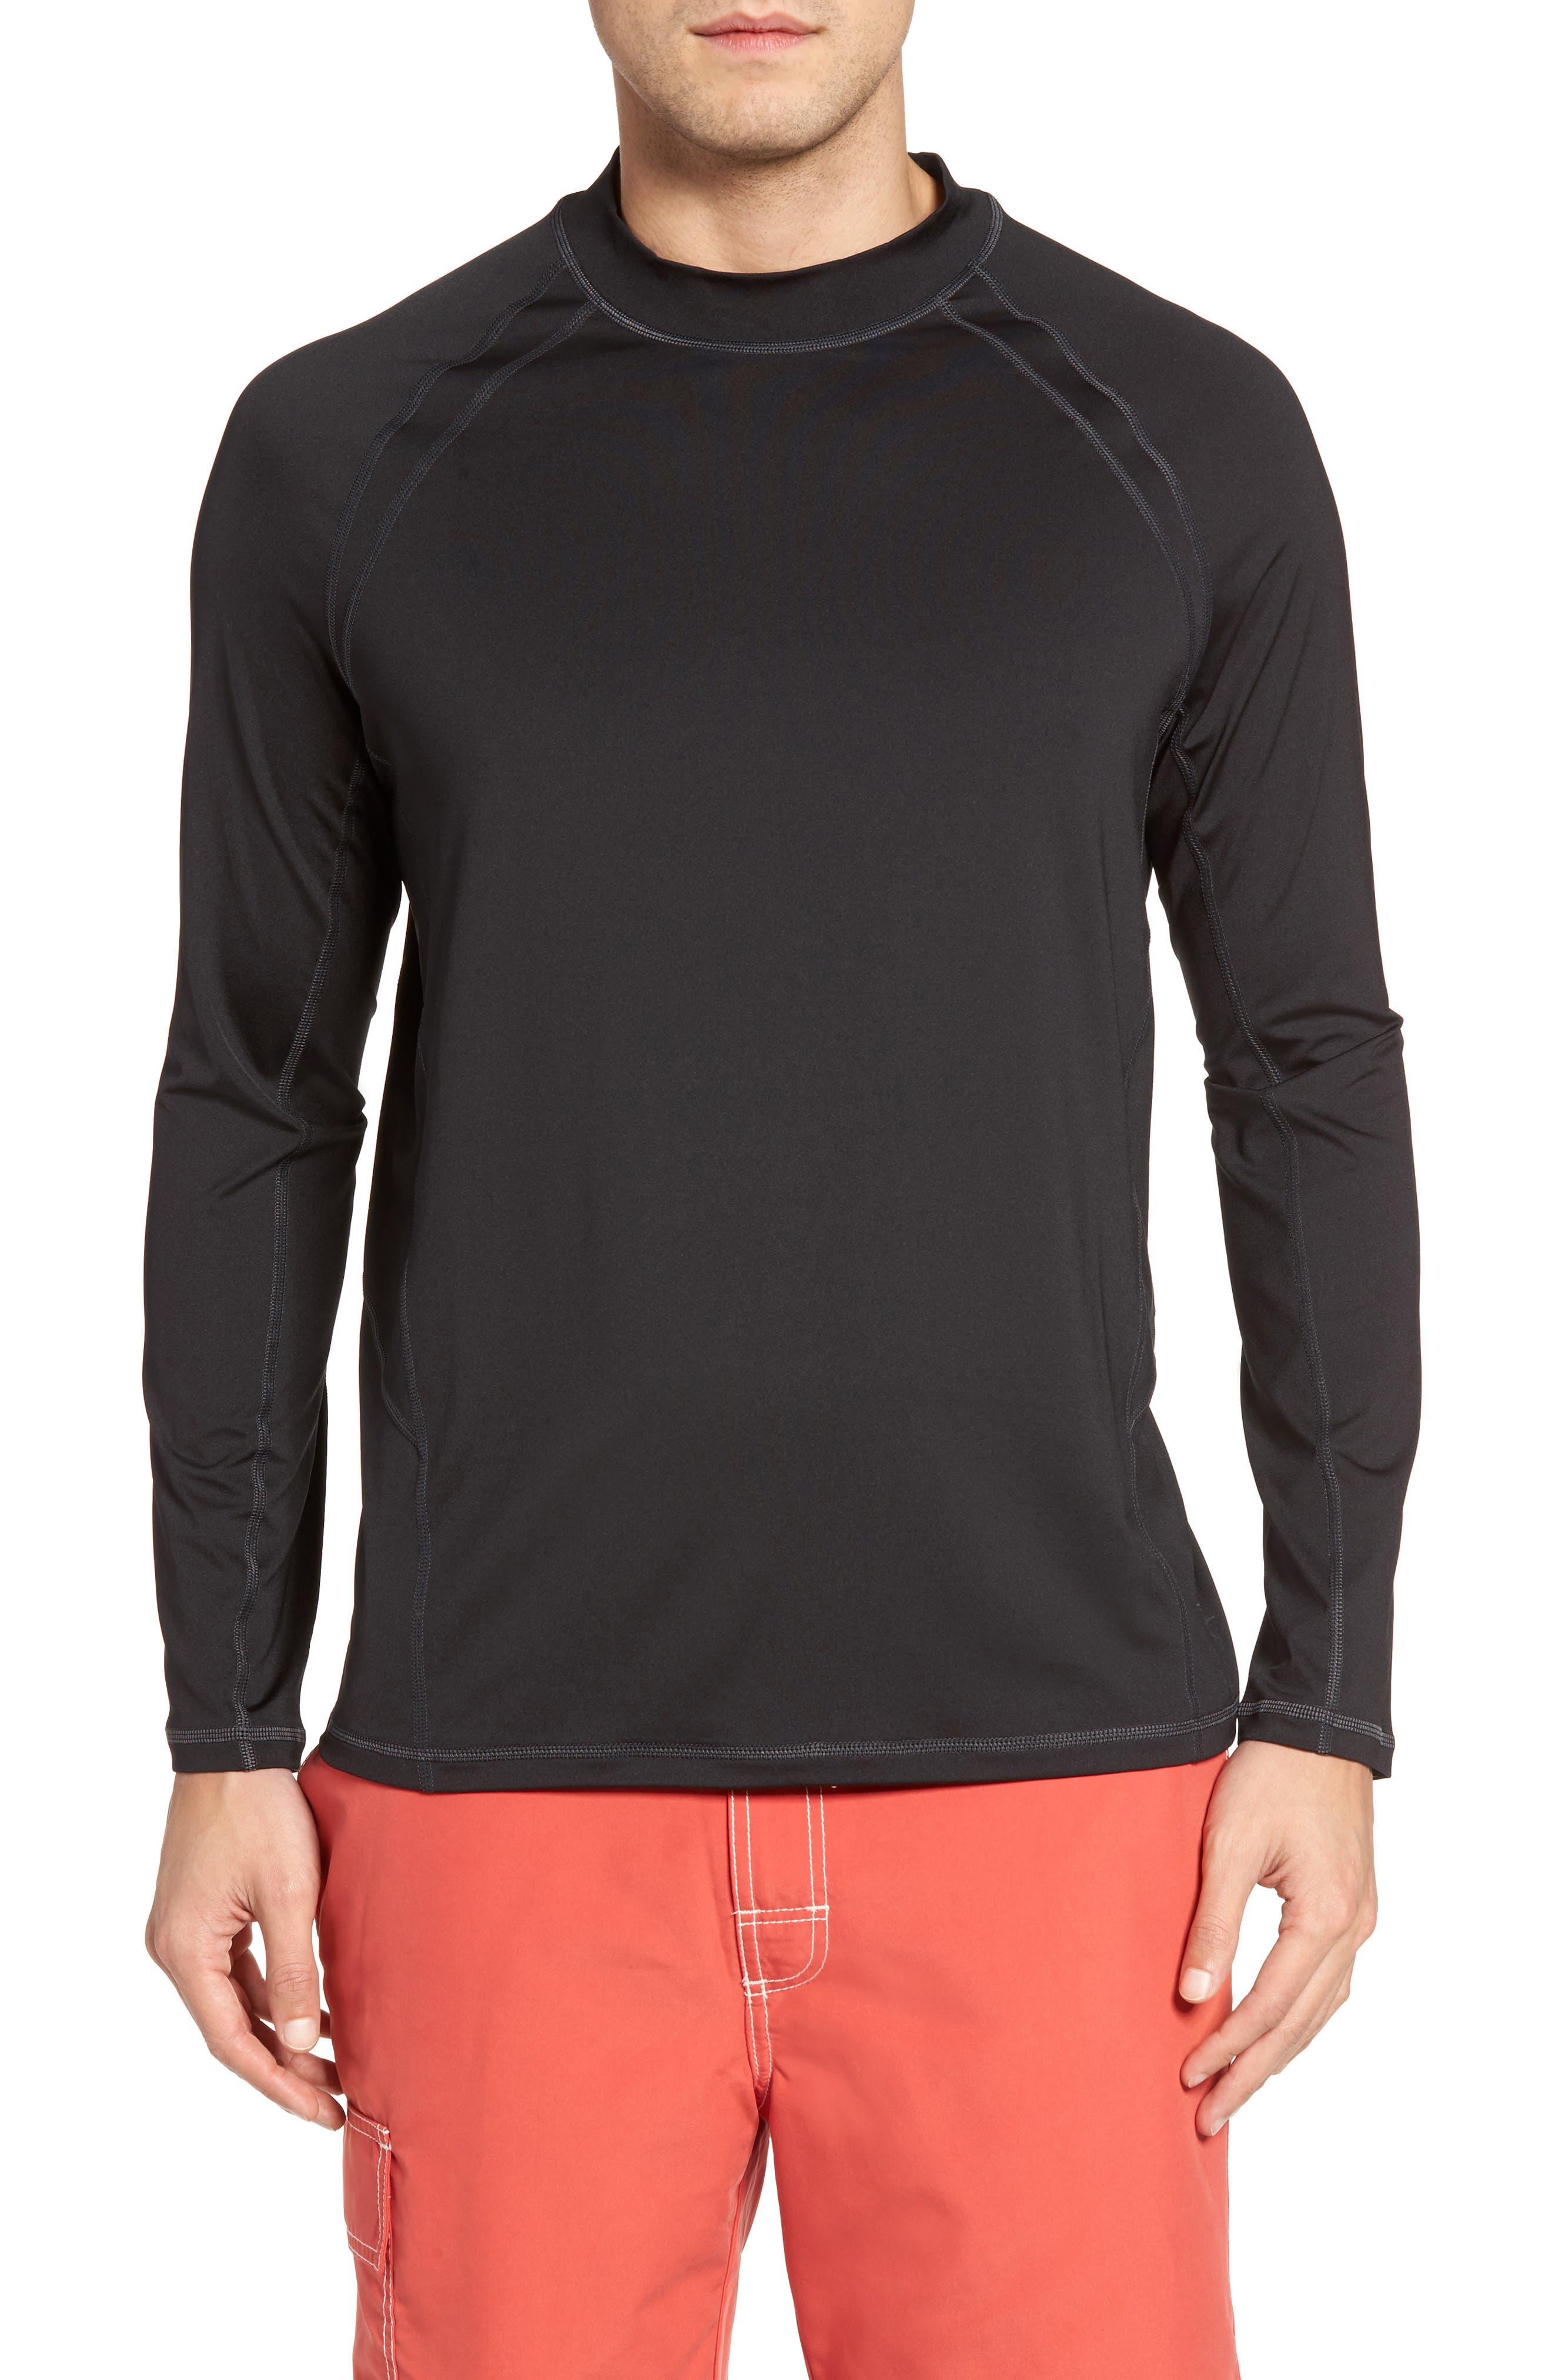 Tommy Bahama Surf Chaser Crewneck T-Shirt (Big & Tall)